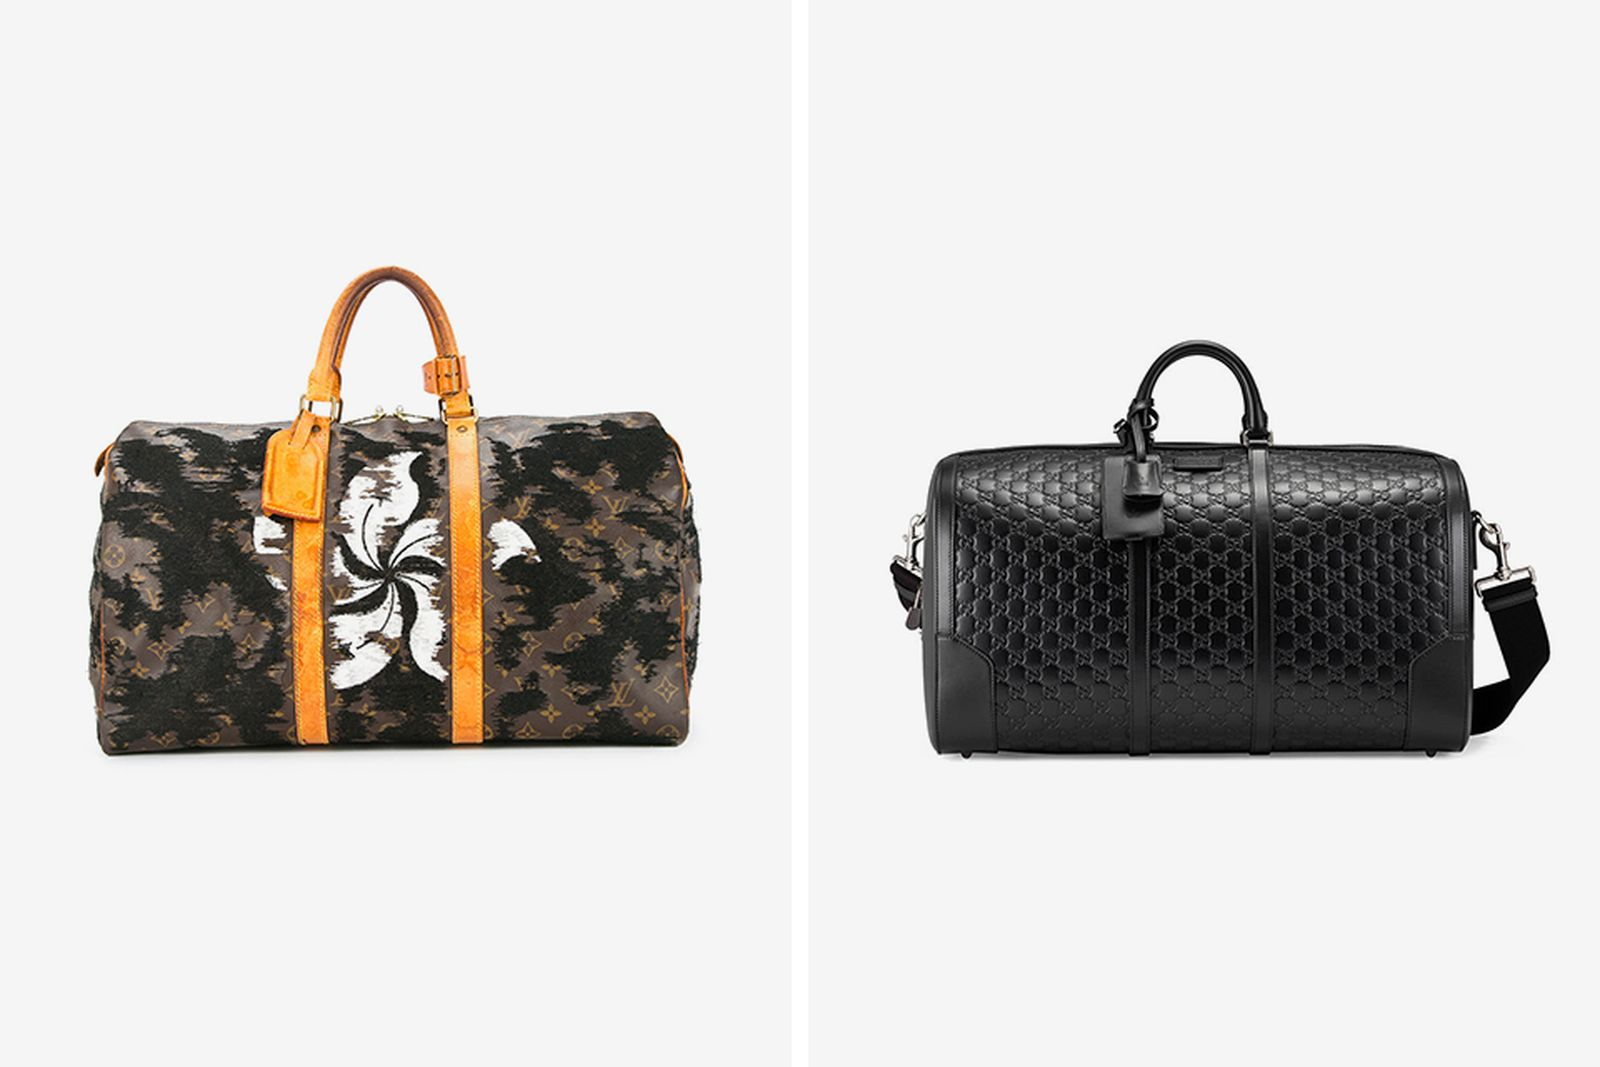 luggage-main